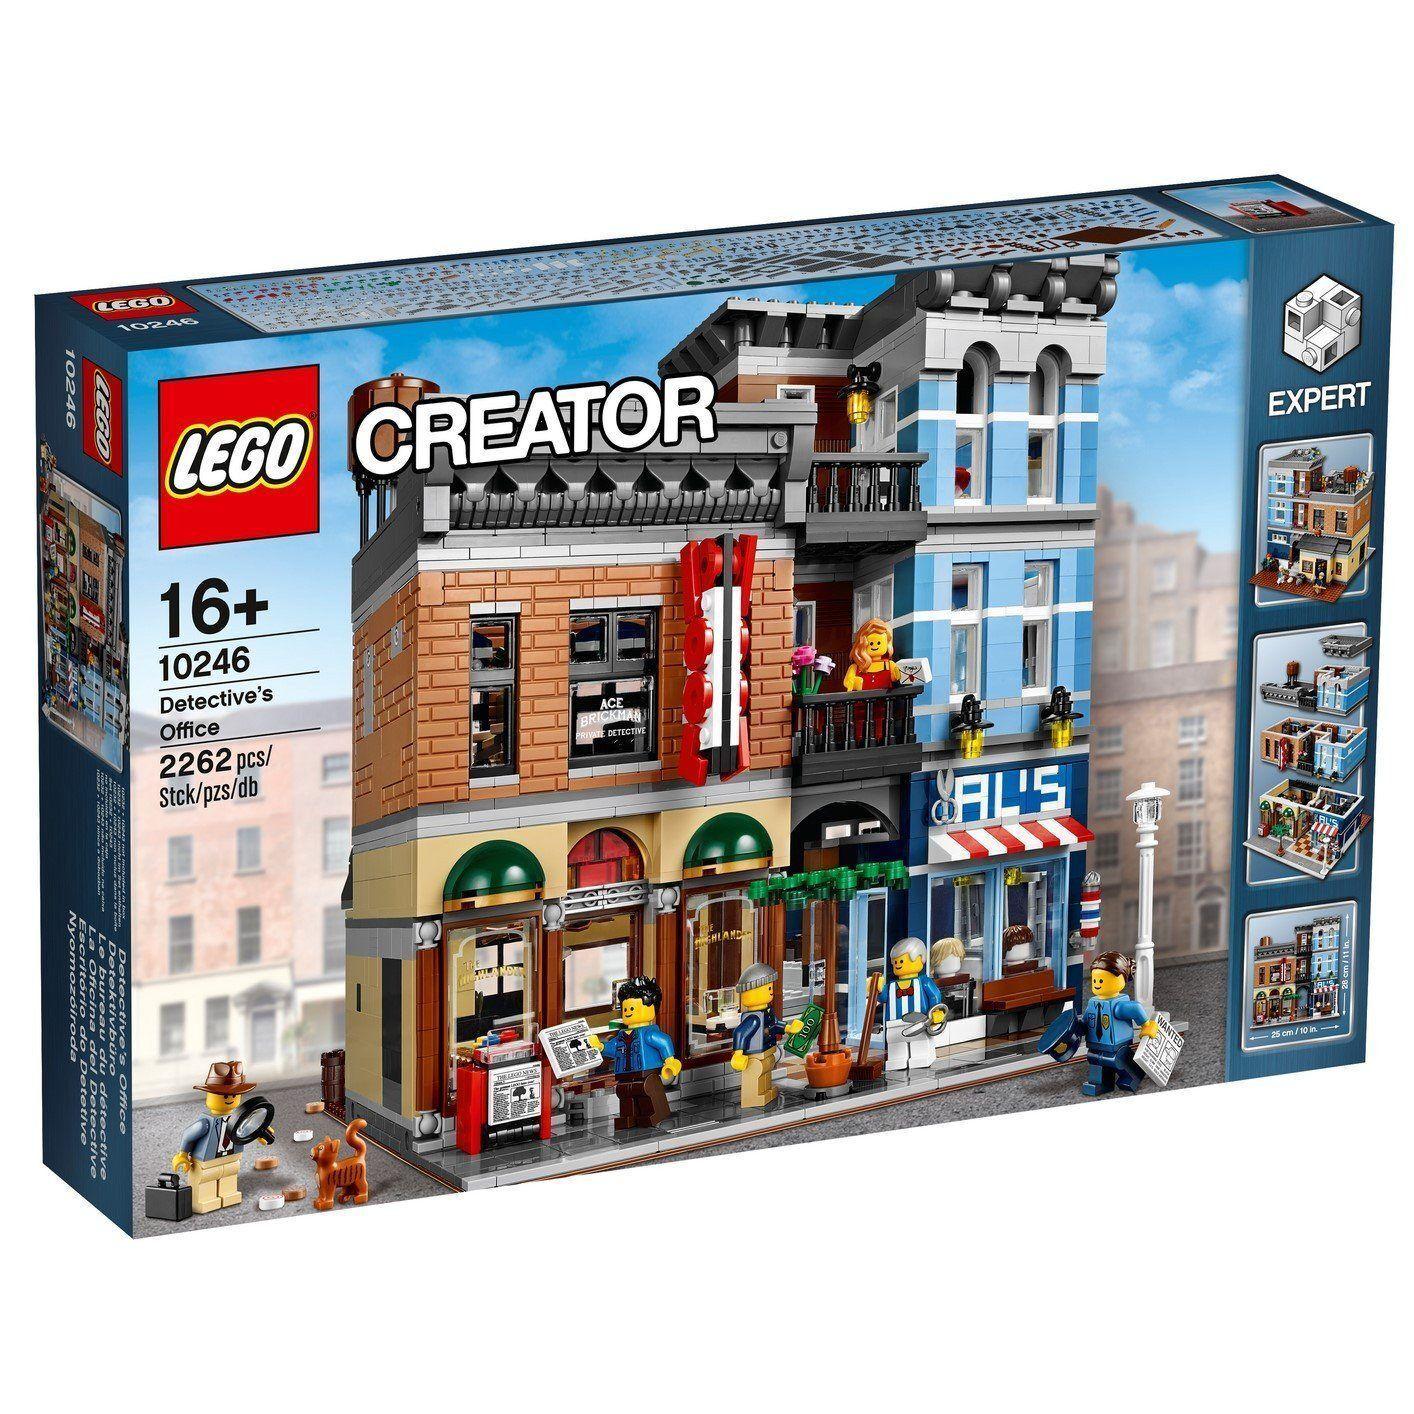 Lego 10246 Detective's Office-FACTORY SEALED  Expédition Mondiale